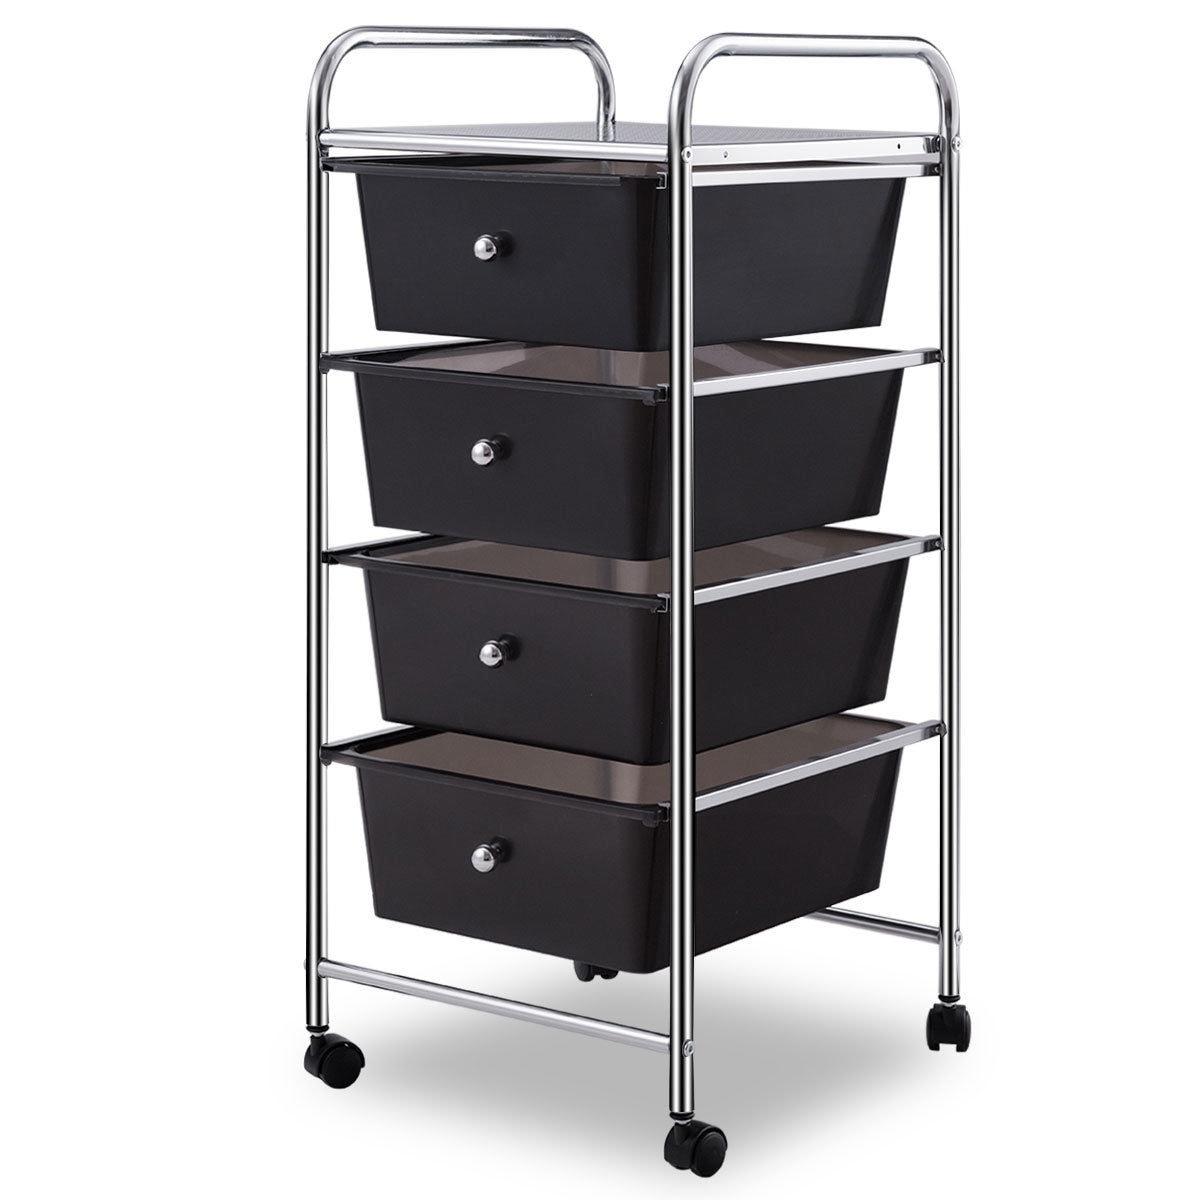 Costway 4 Drawers Metal Rolling Storage Cart Scrapbook Supply U0026 Paper Home  Office   As Pic